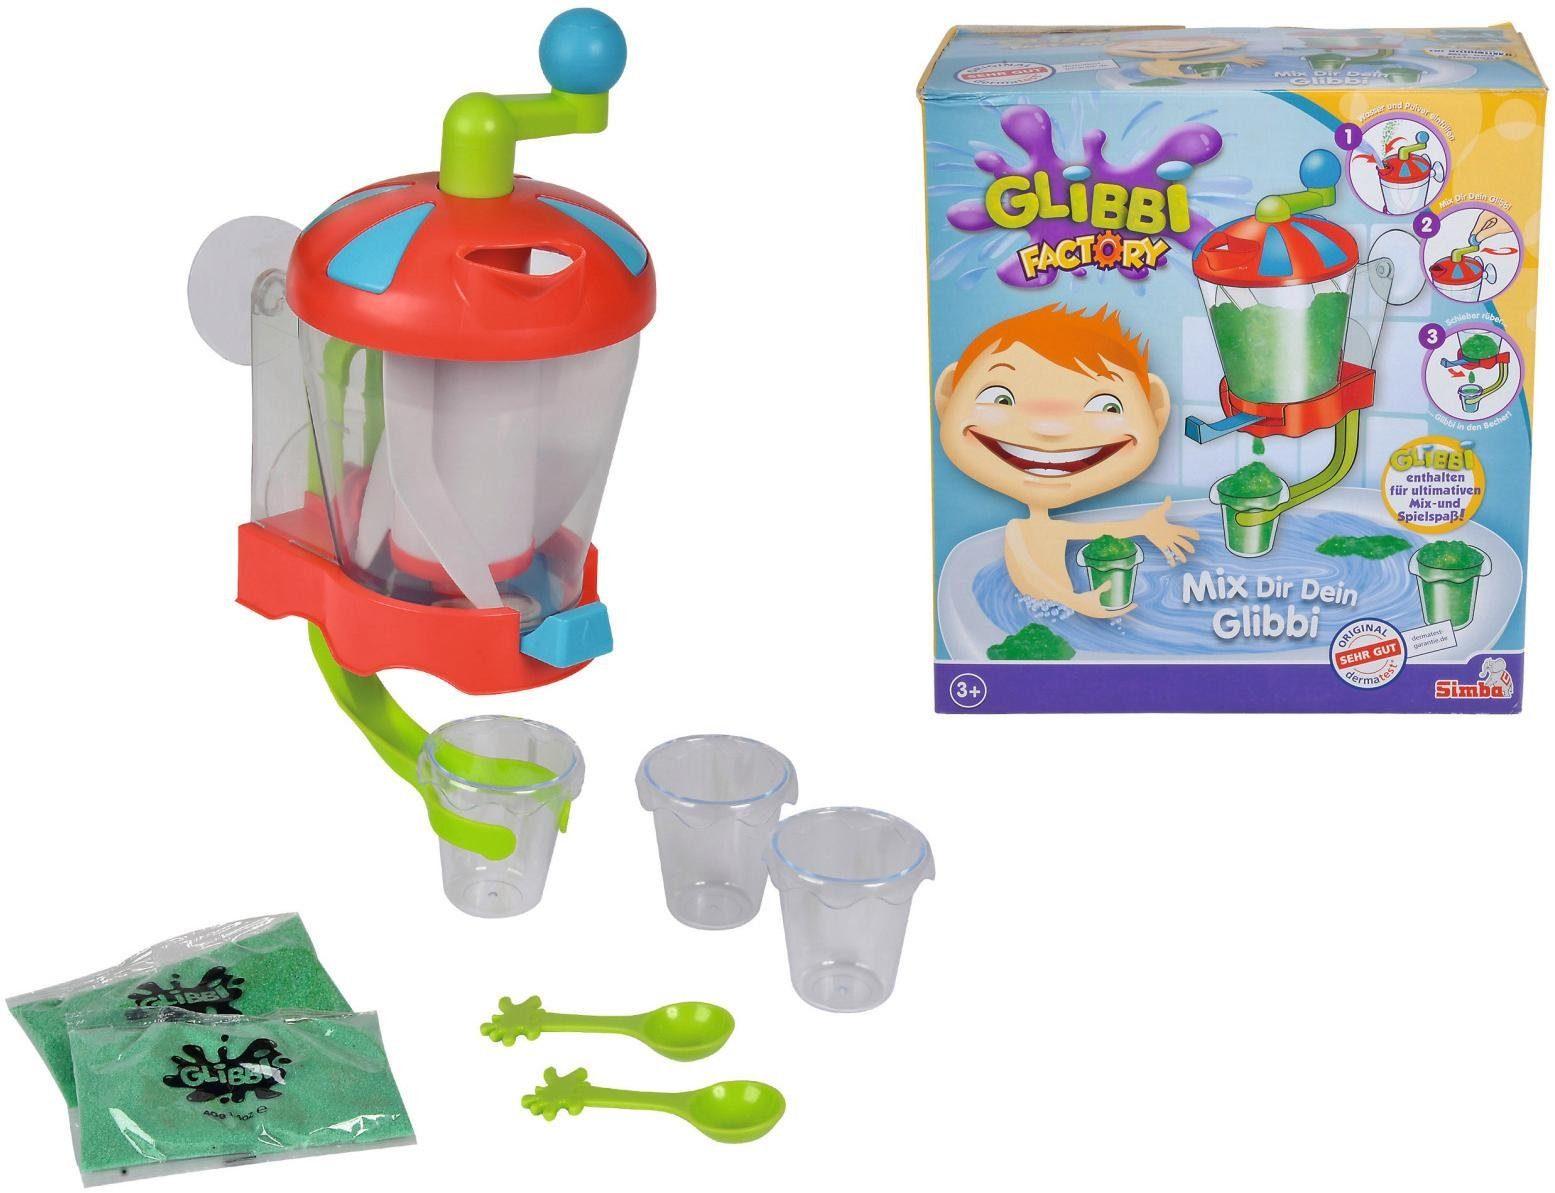 Simba Badespielzeug, »Glibbi Factory«